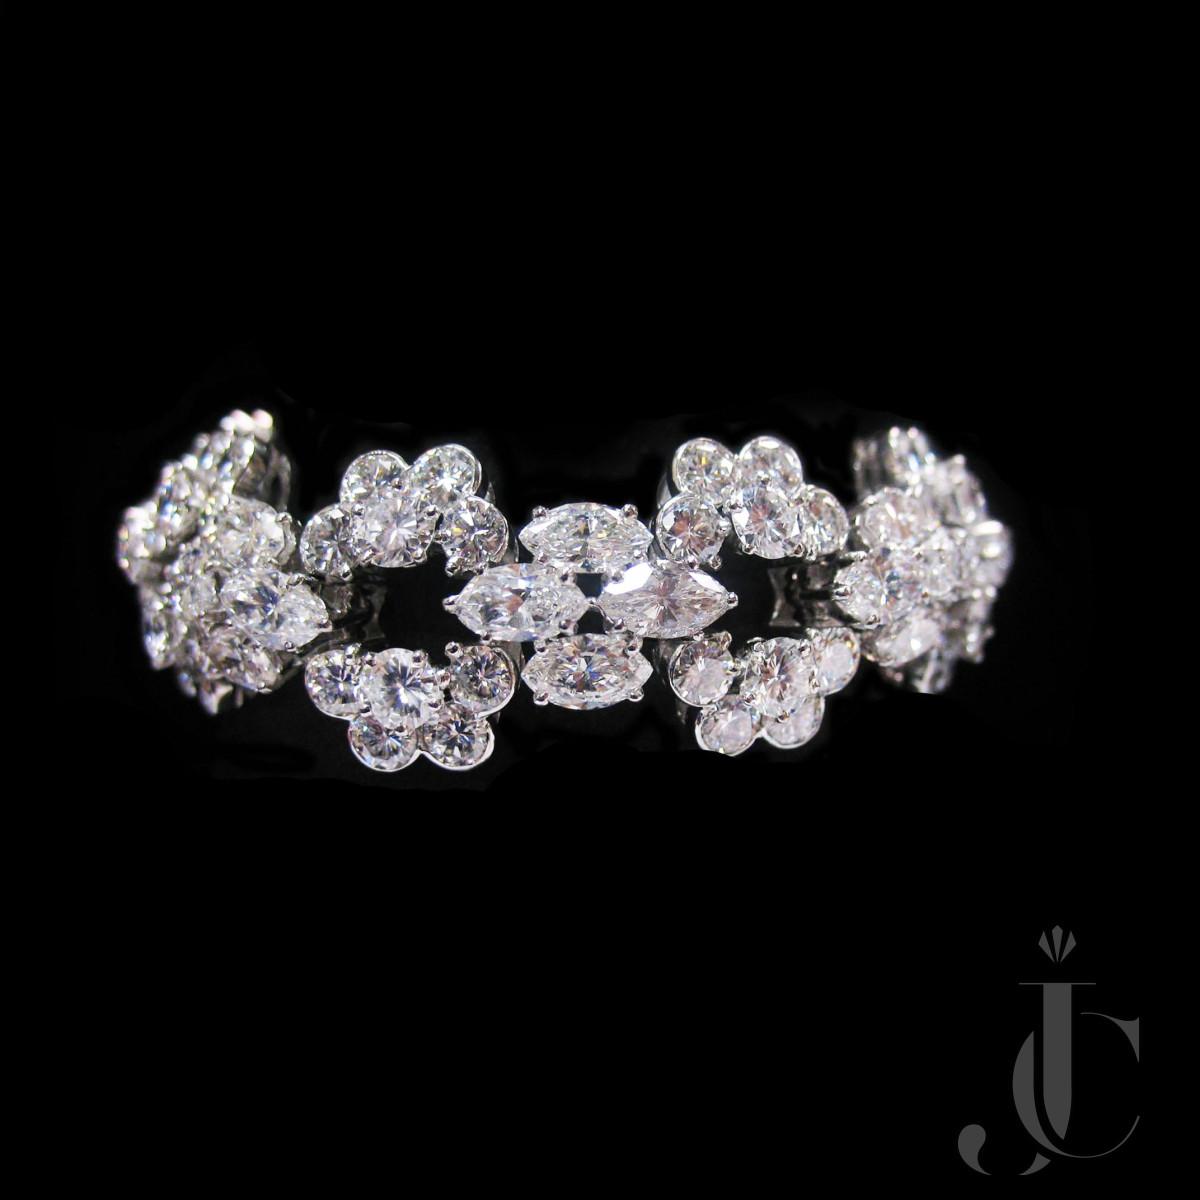 Platinum Diamonds Bracelet by Van Cleef & Arpels - Paris, circa 1965